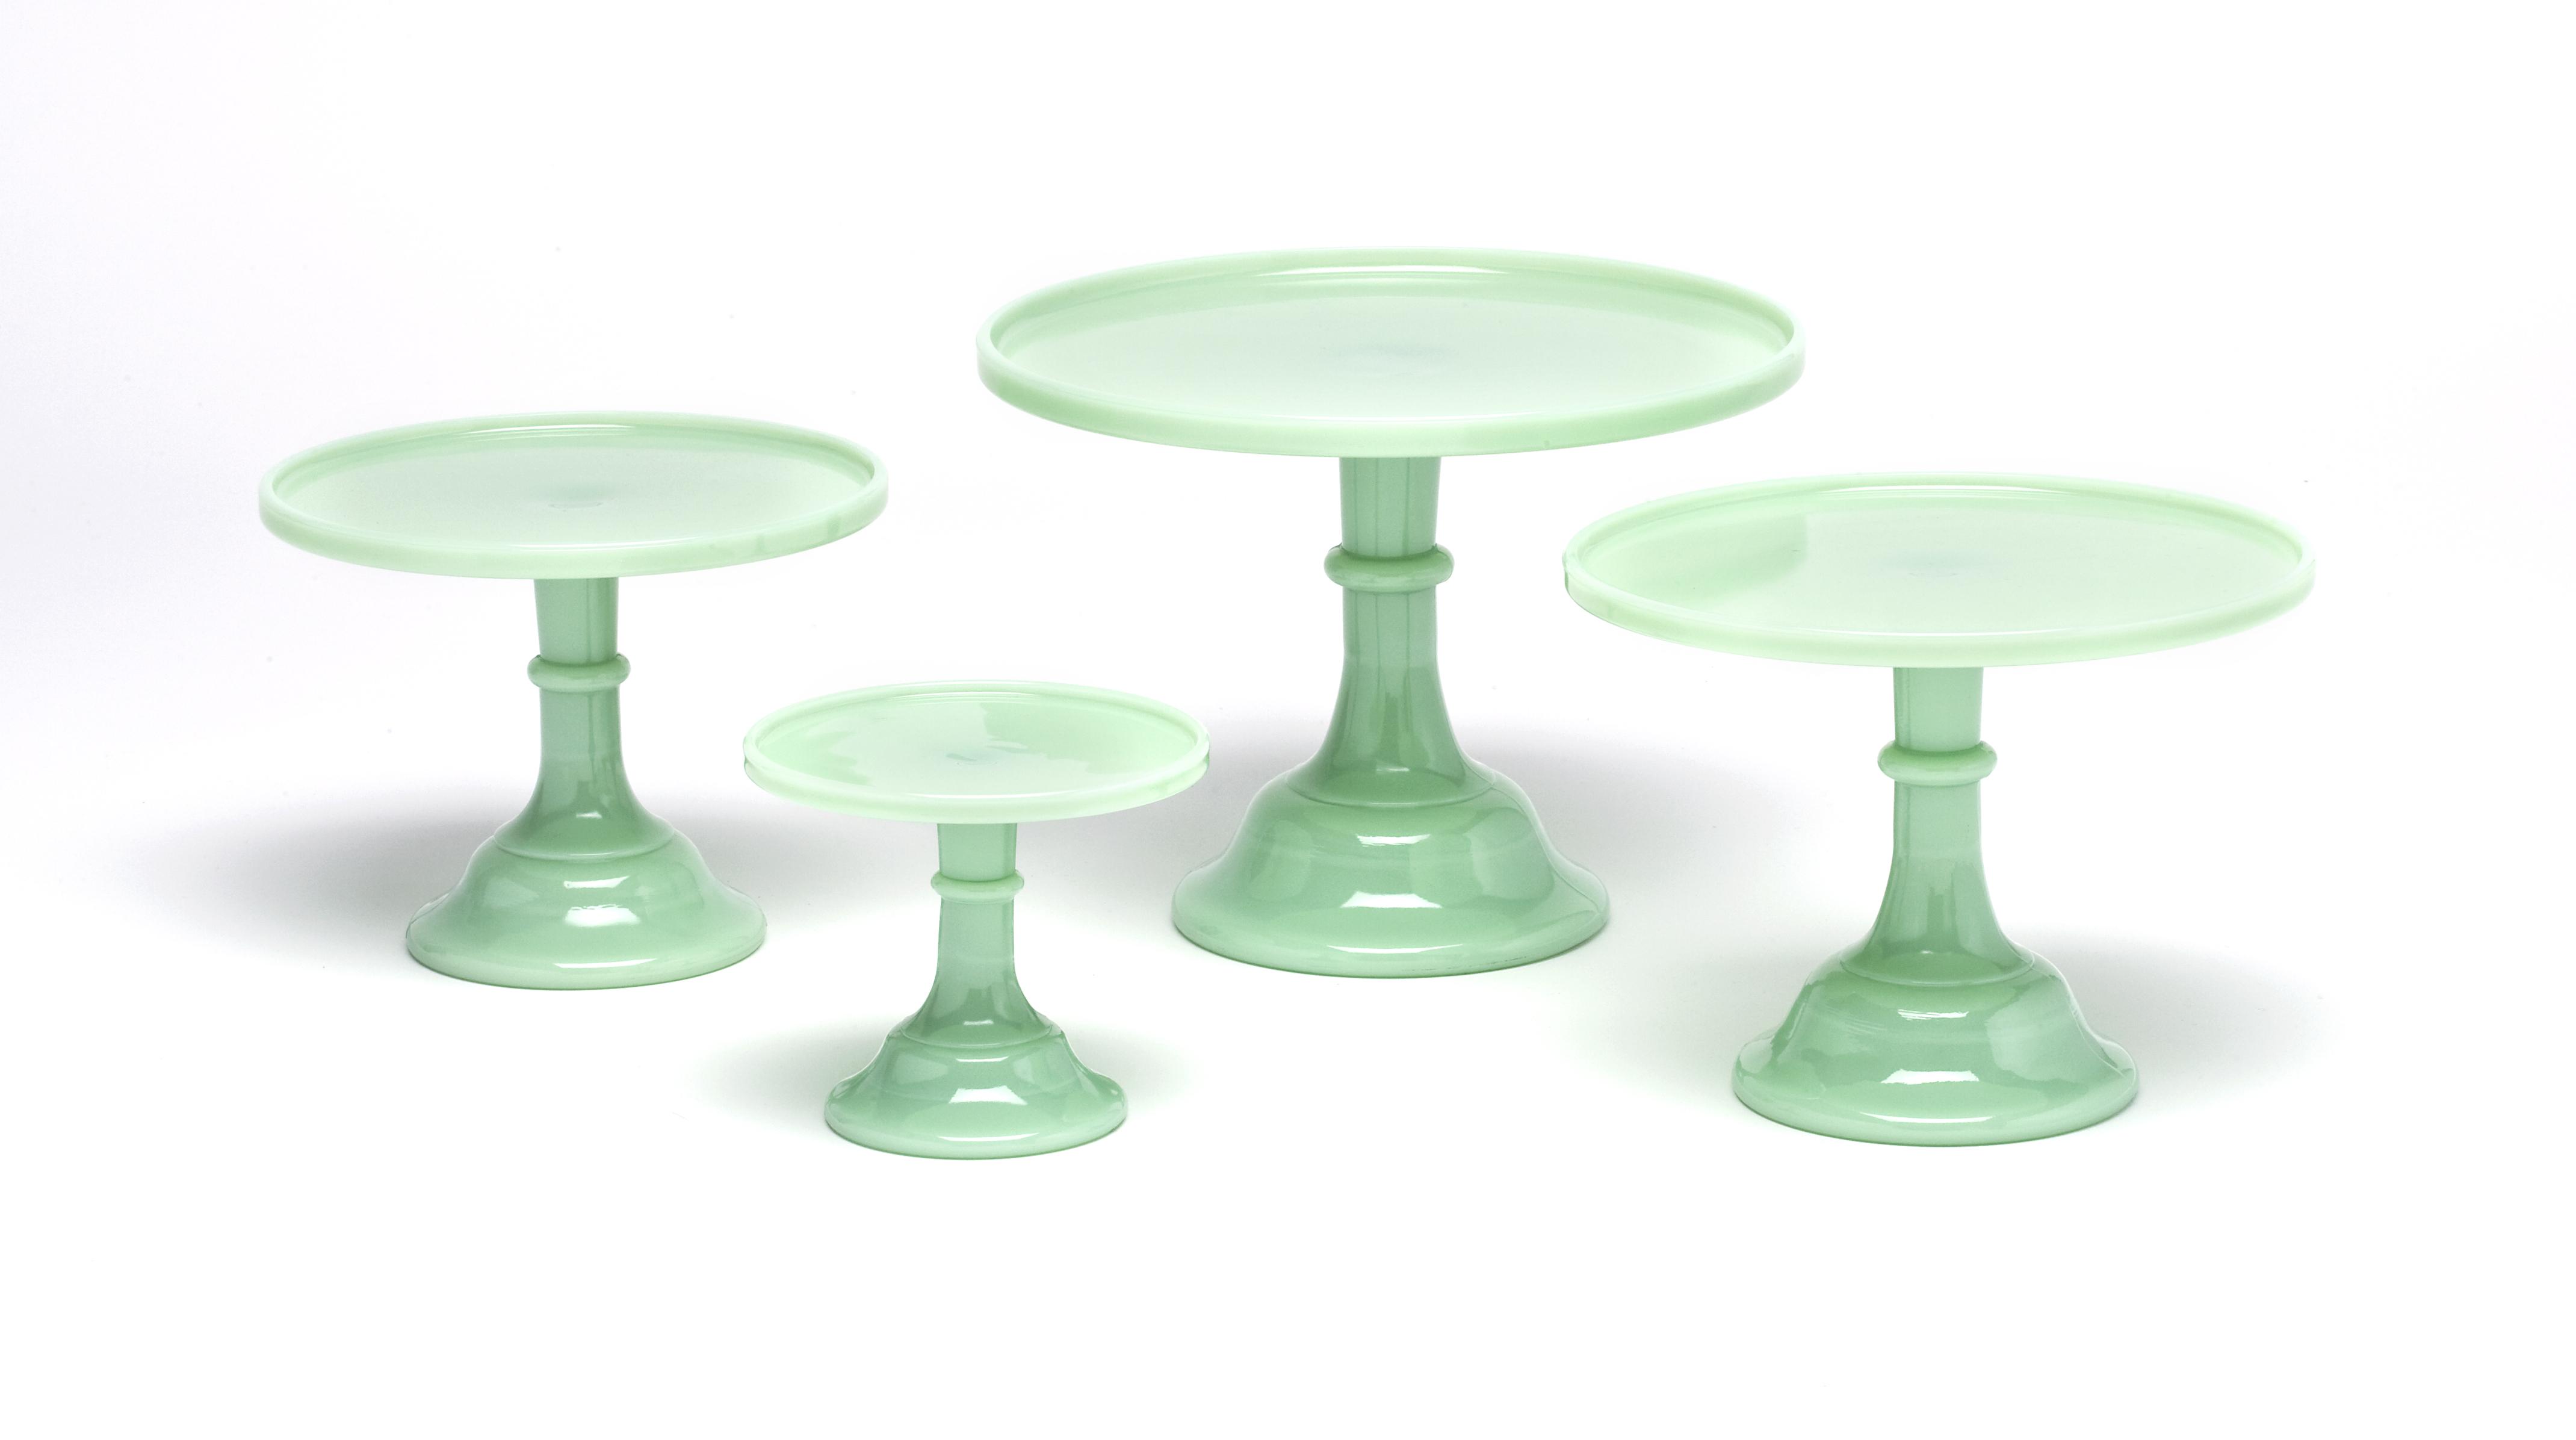 Mosser Glass